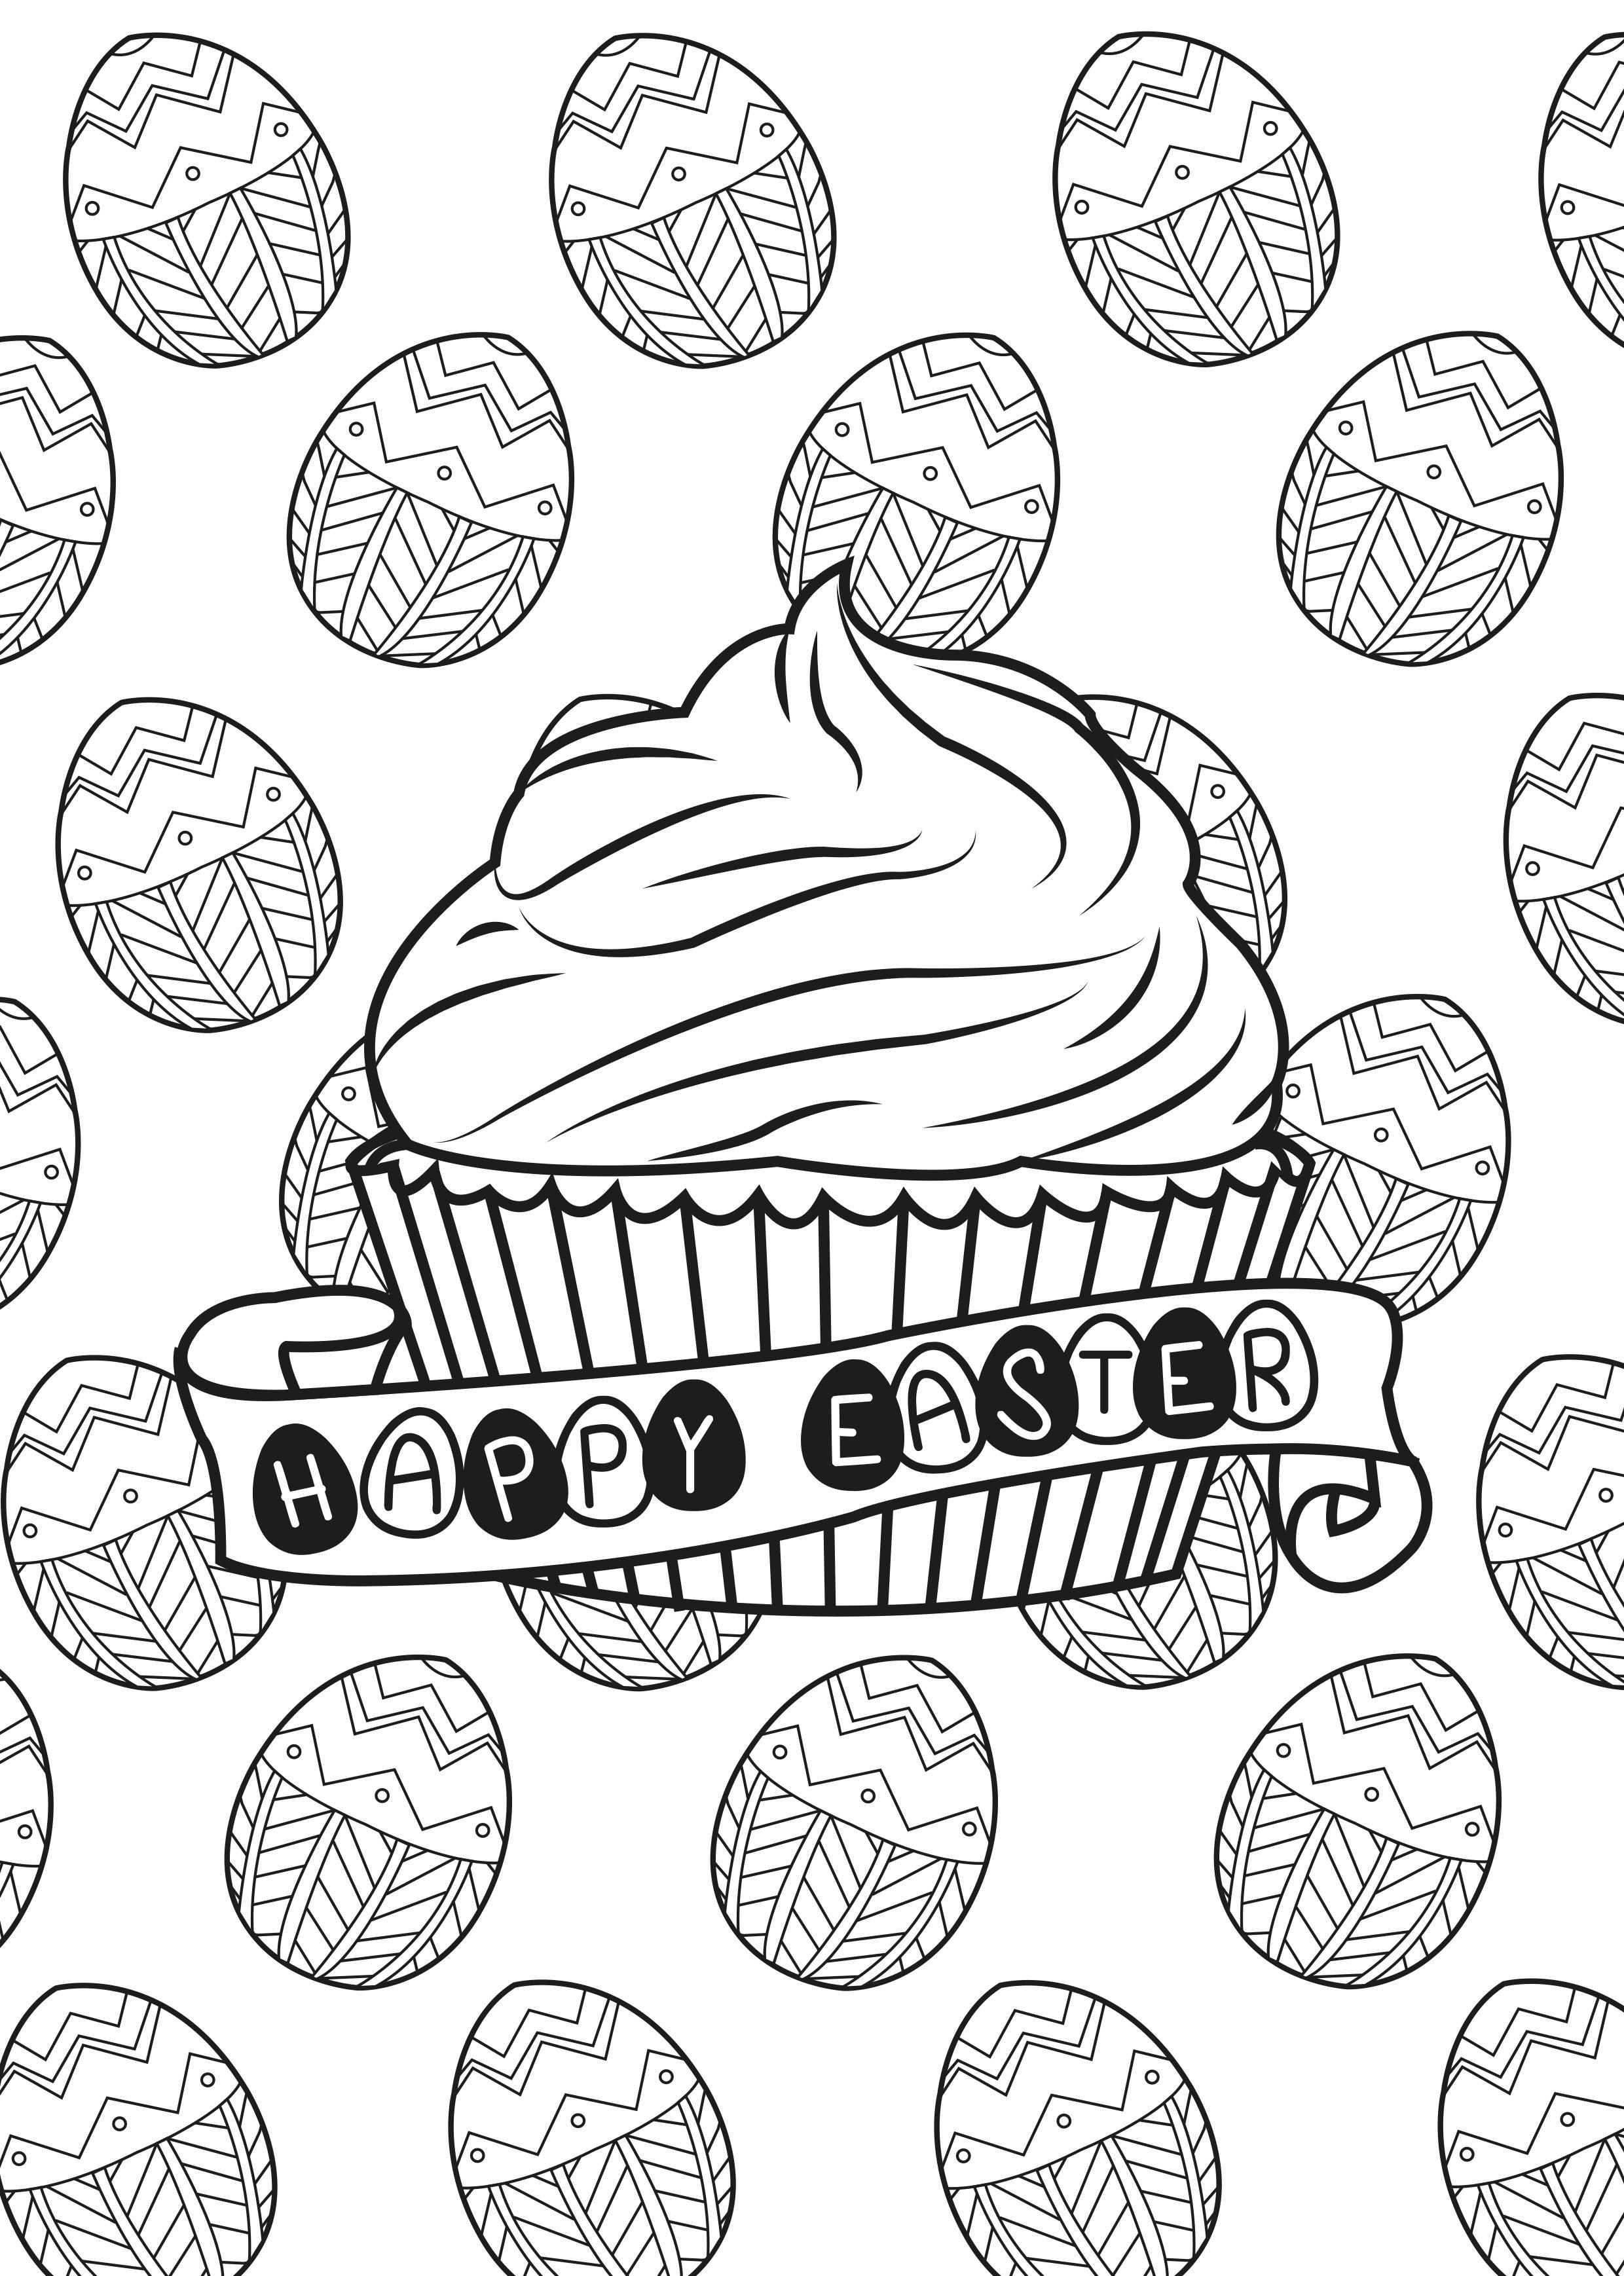 Cup cakes 26368 - Cup Cakes - Colorear para Adultos